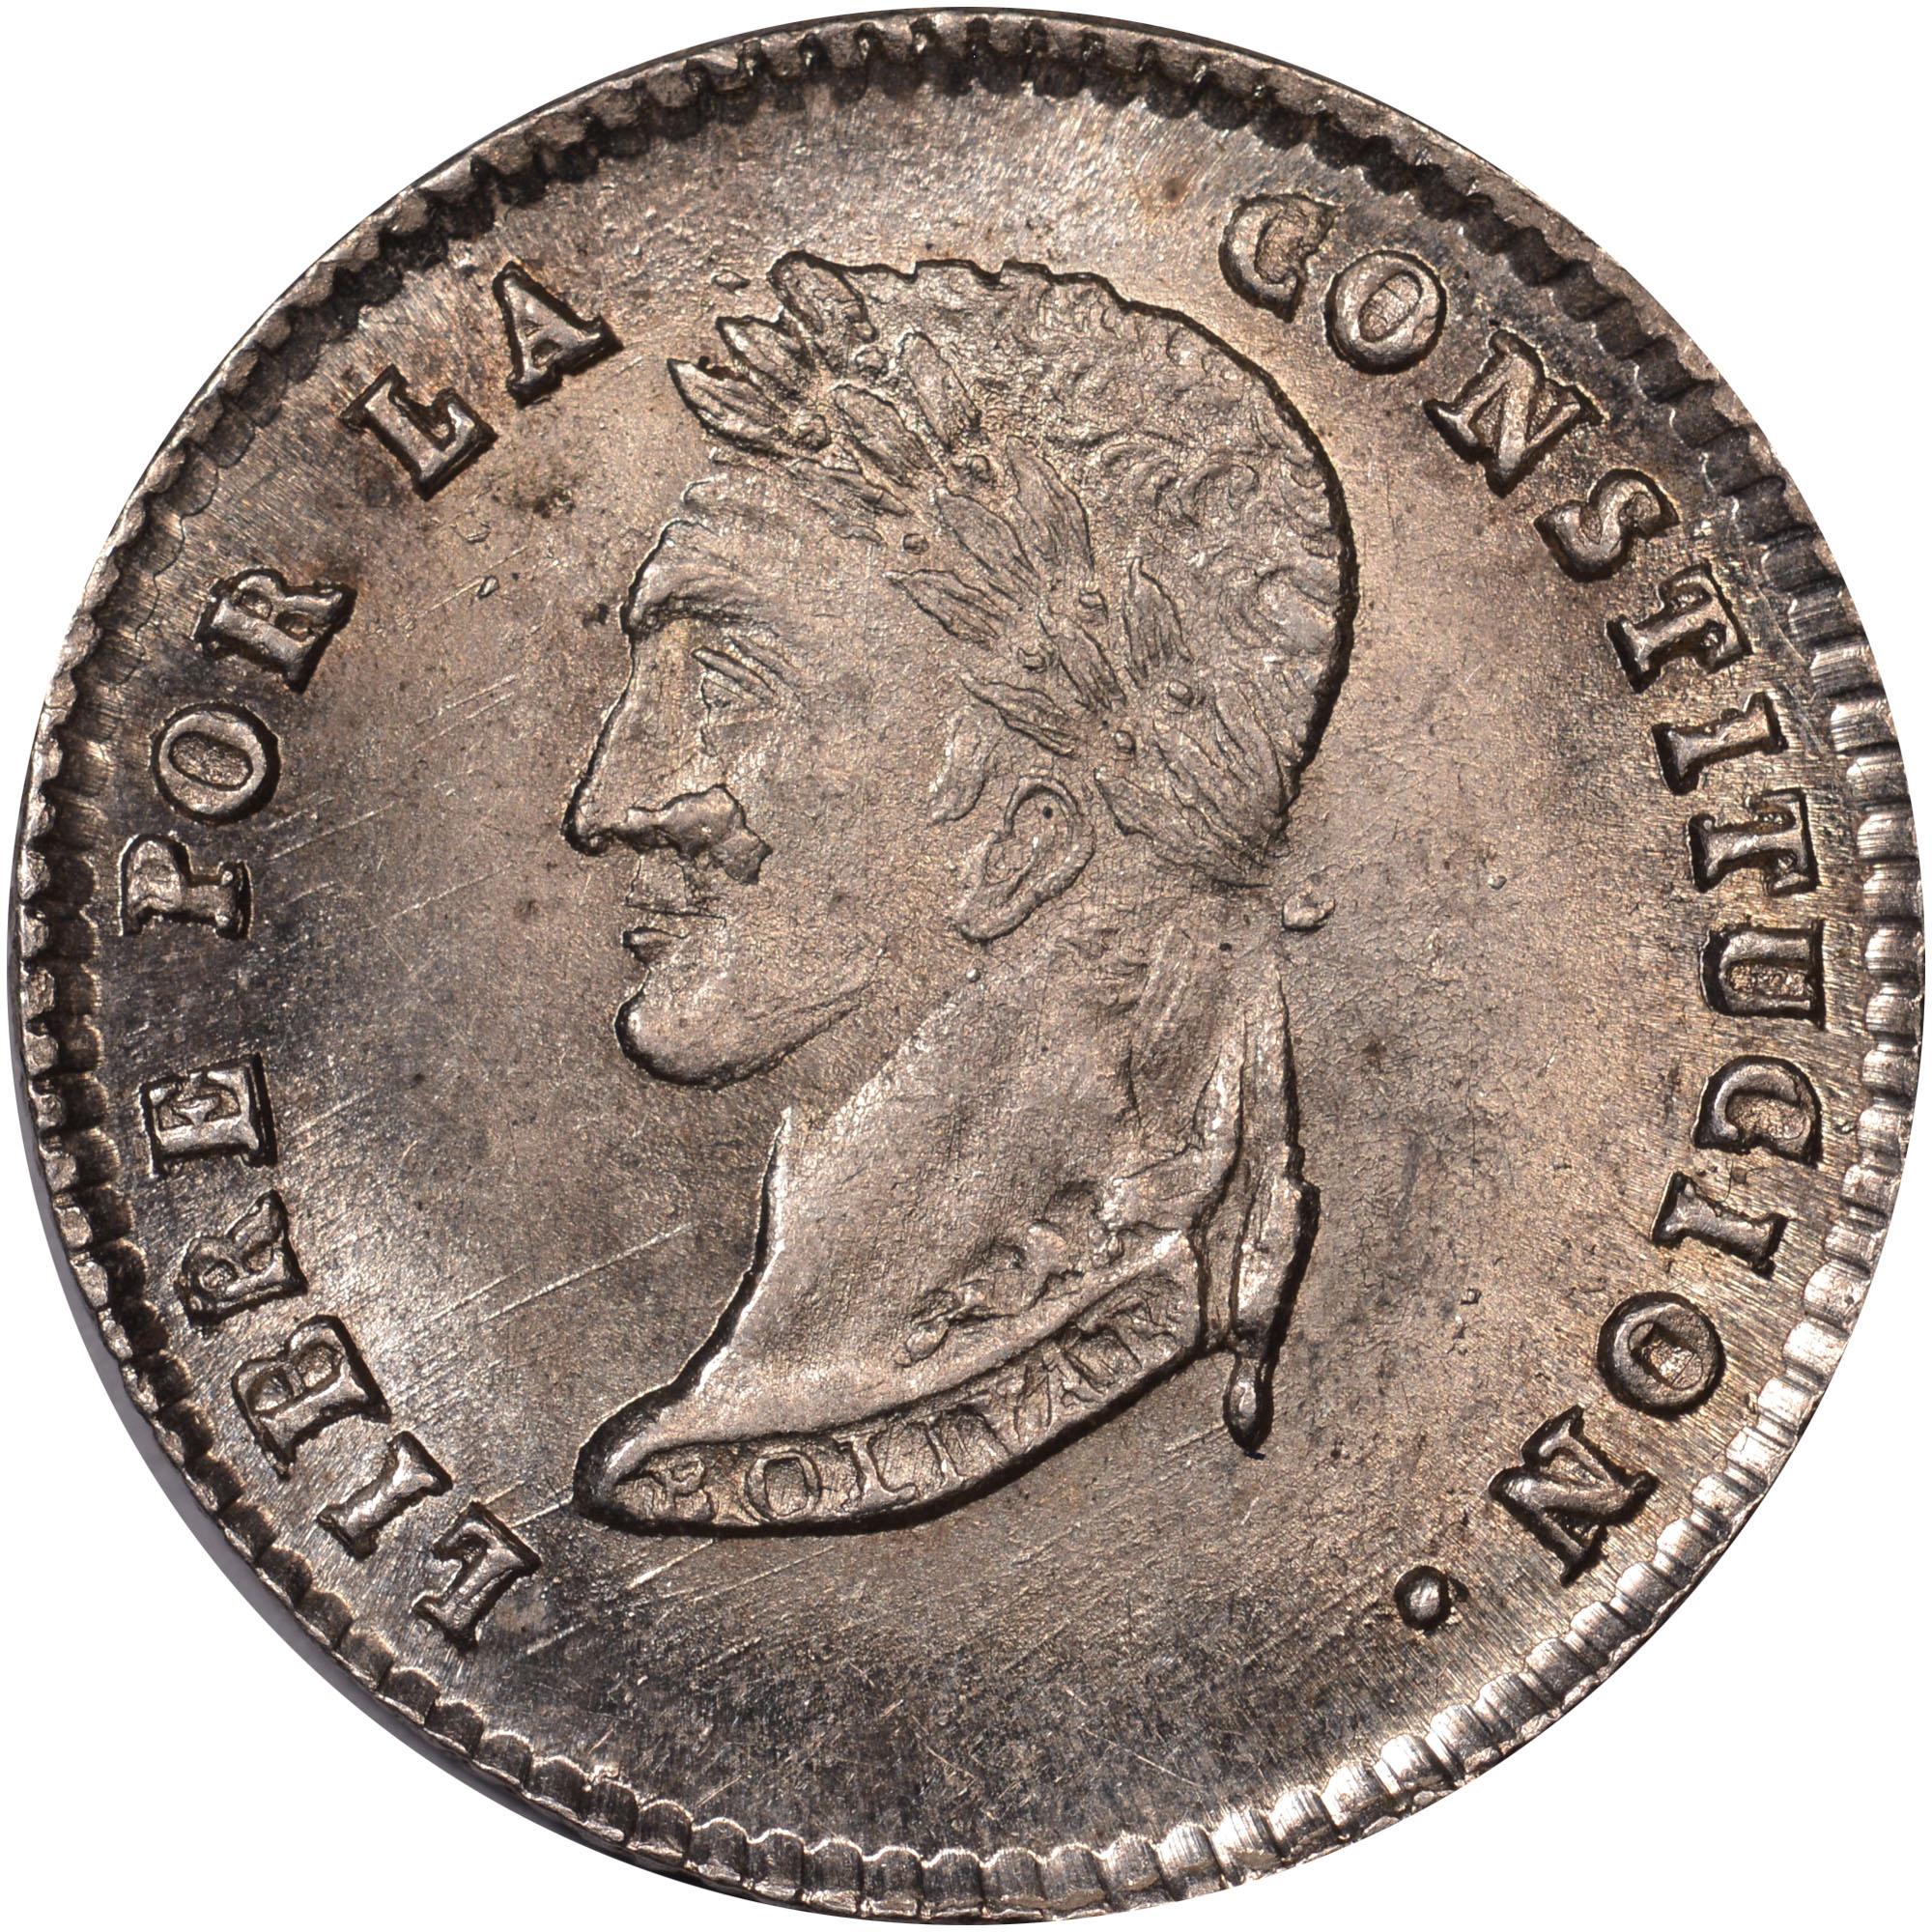 1853-1854 Bolivia Sol reverse